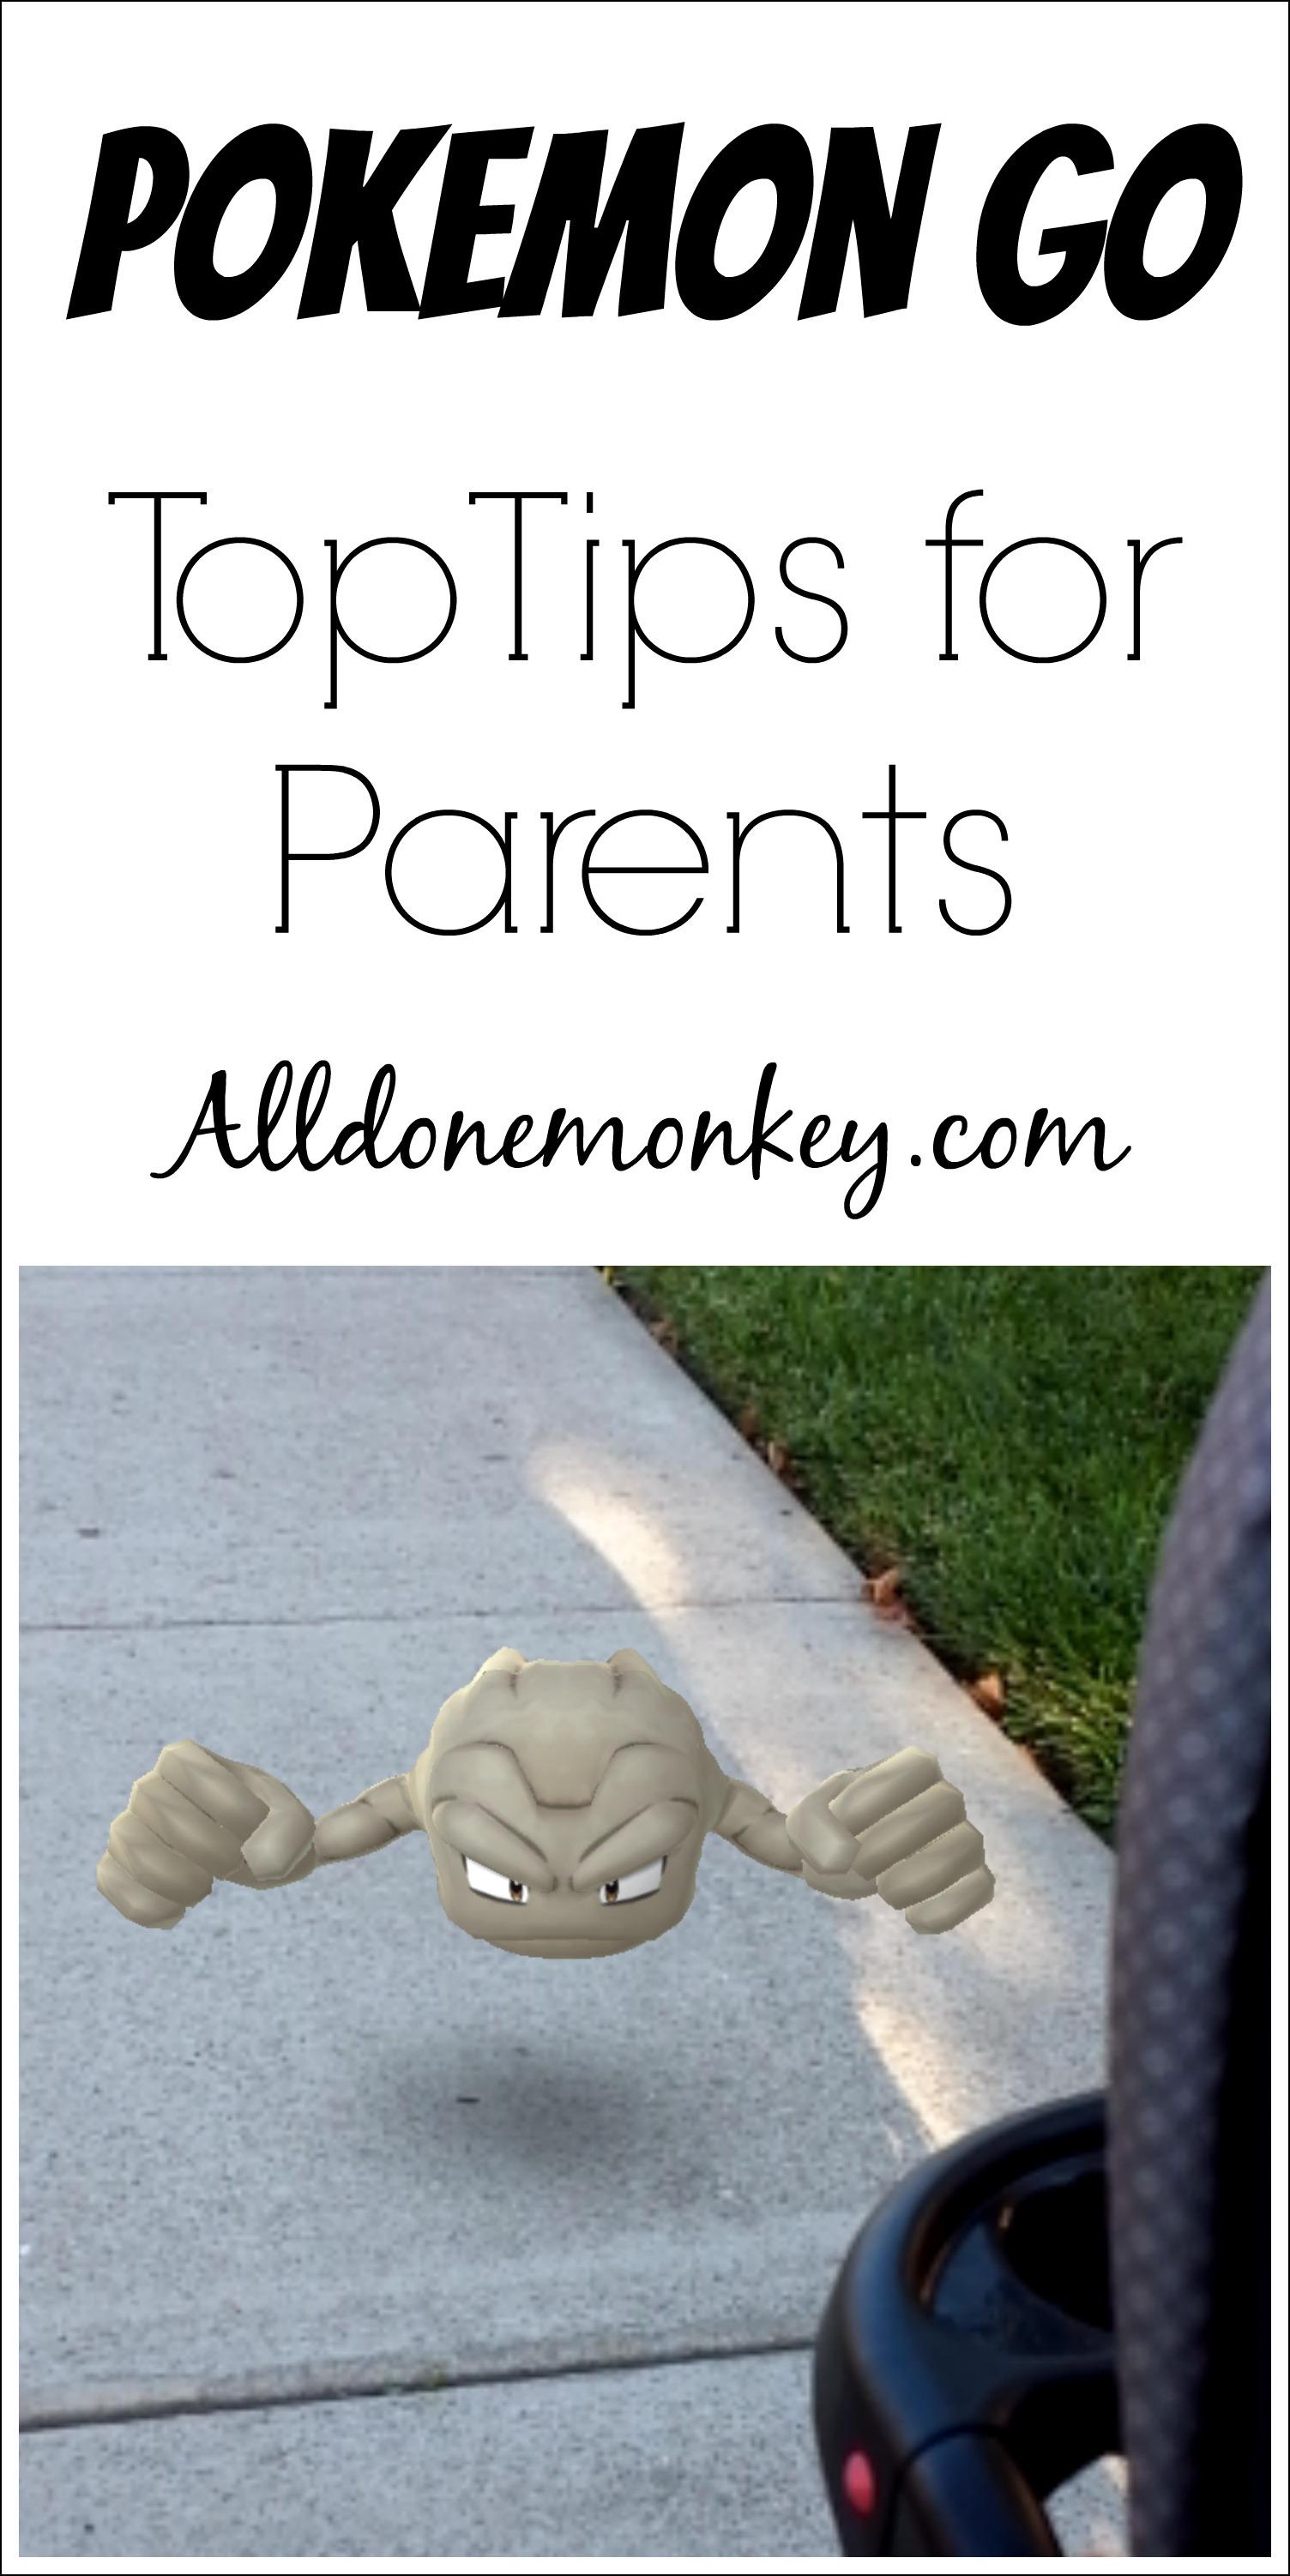 Pokemon Go: Top Tips for Parents | Alldonemonkey.com